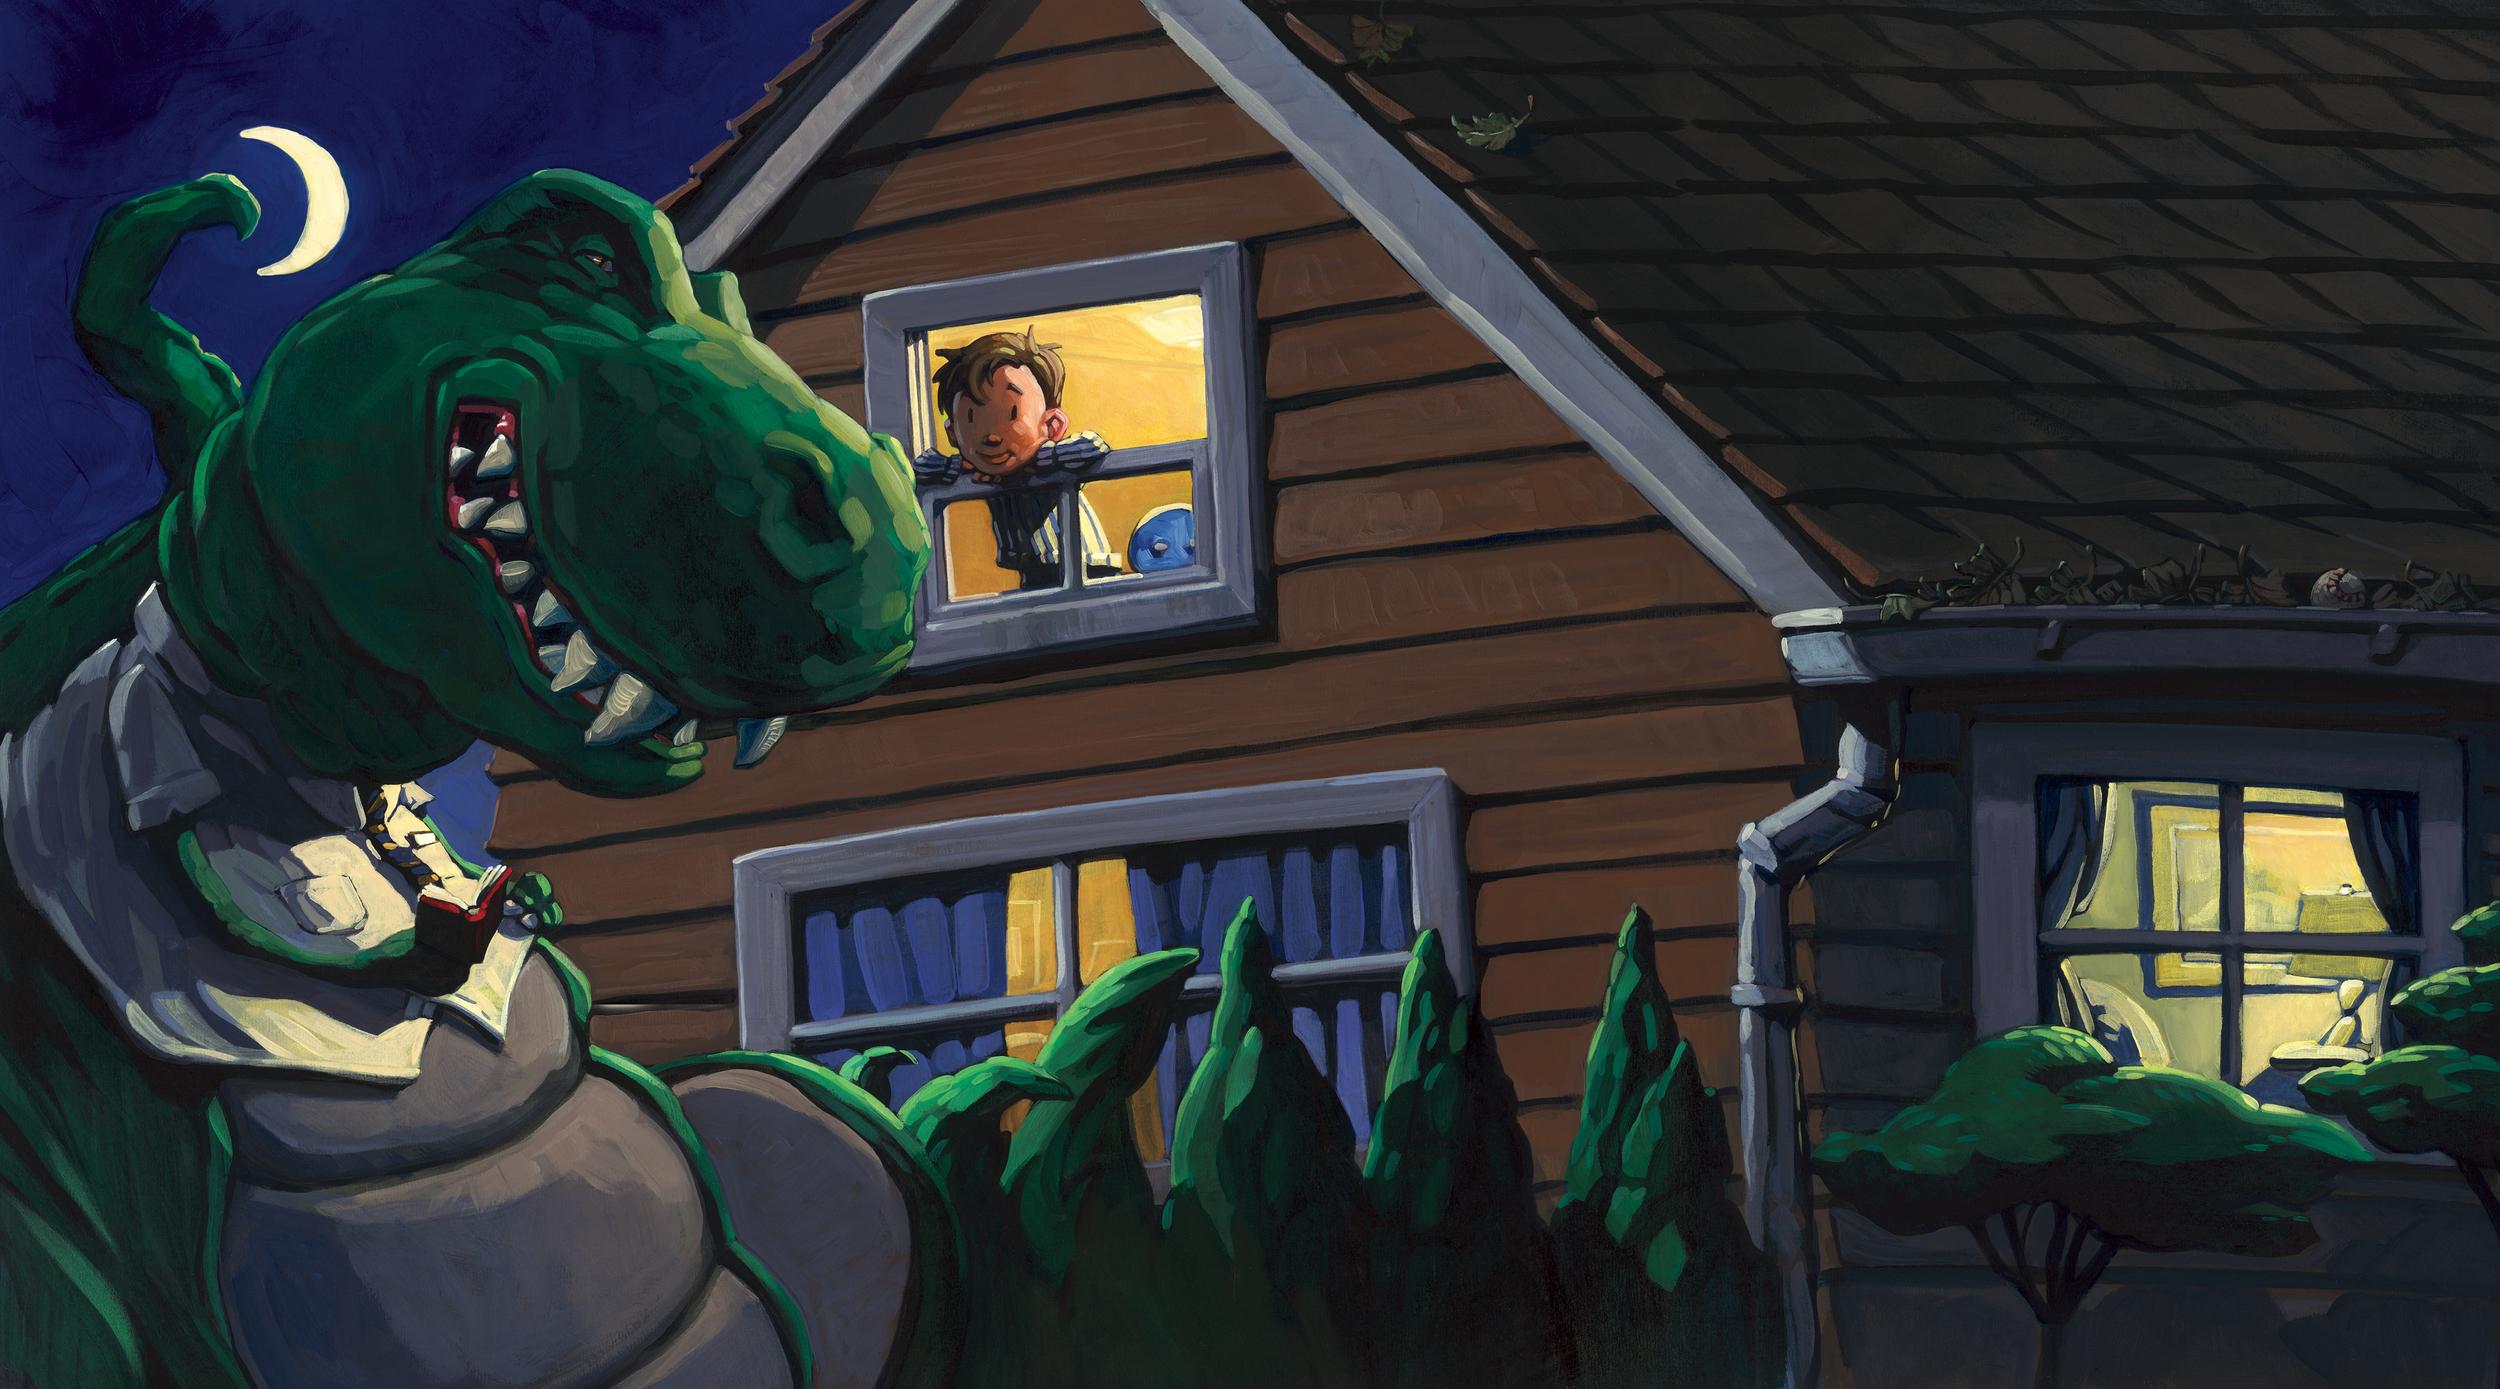 Bedtime Story   • Oil on illustration board